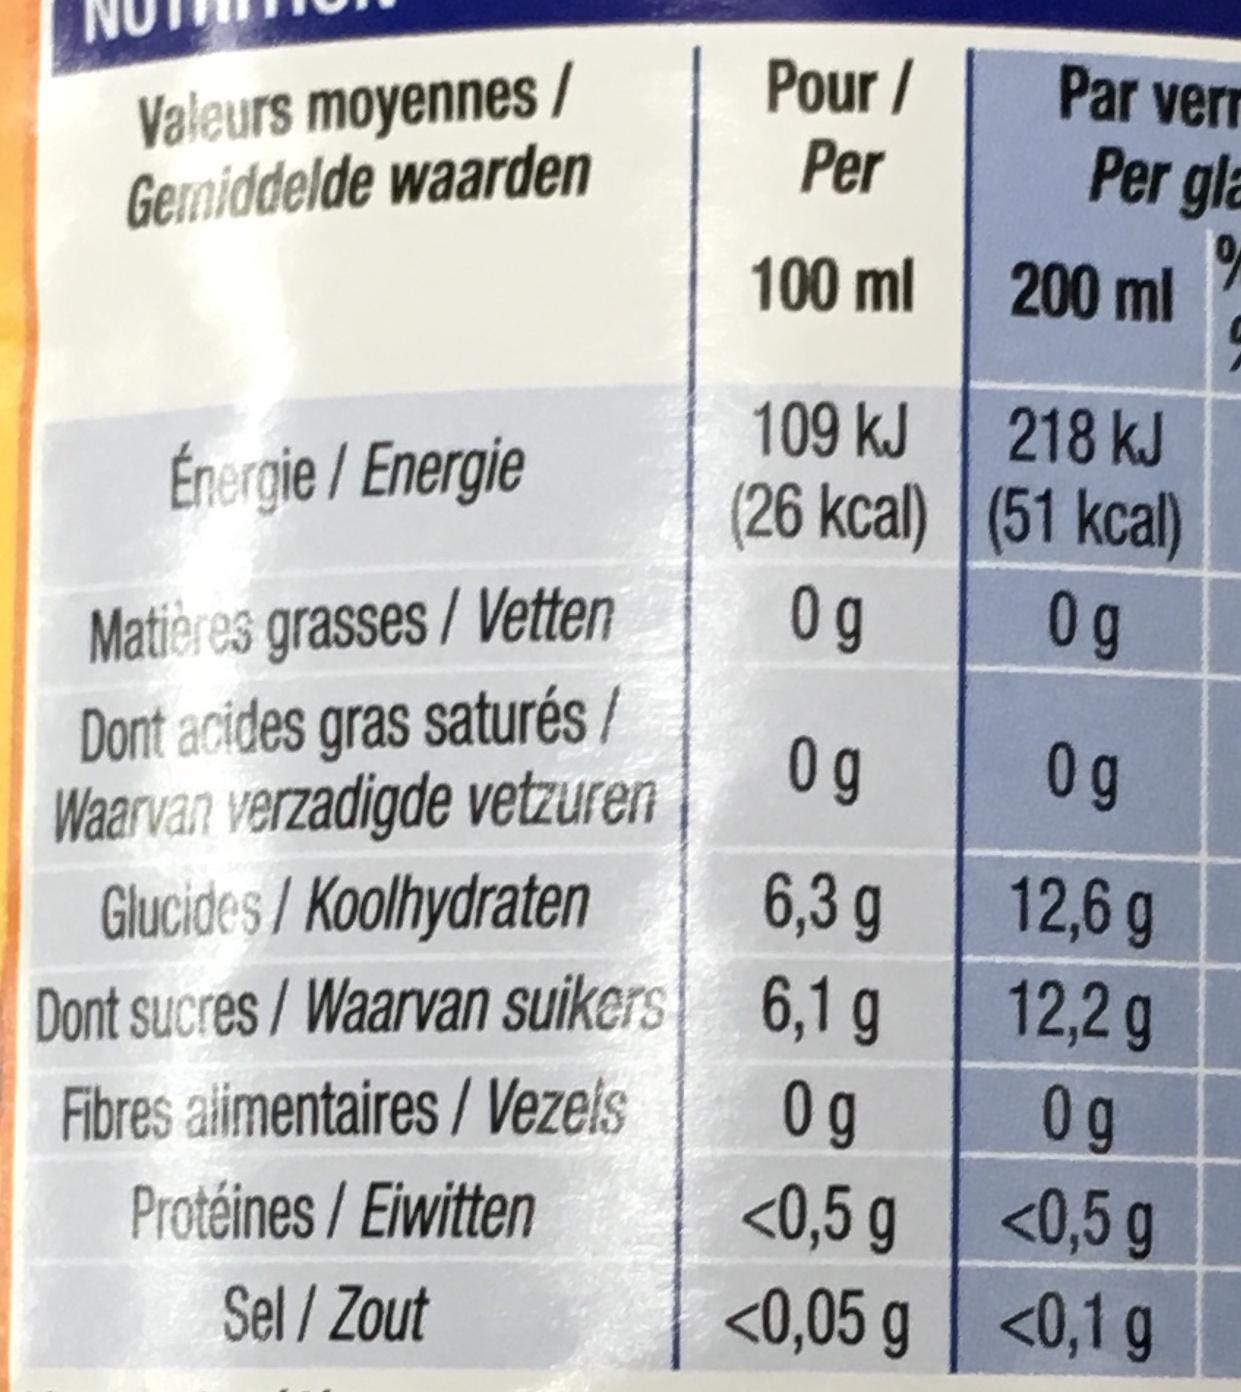 Thé glacé Pêche - Nutrition facts - fr